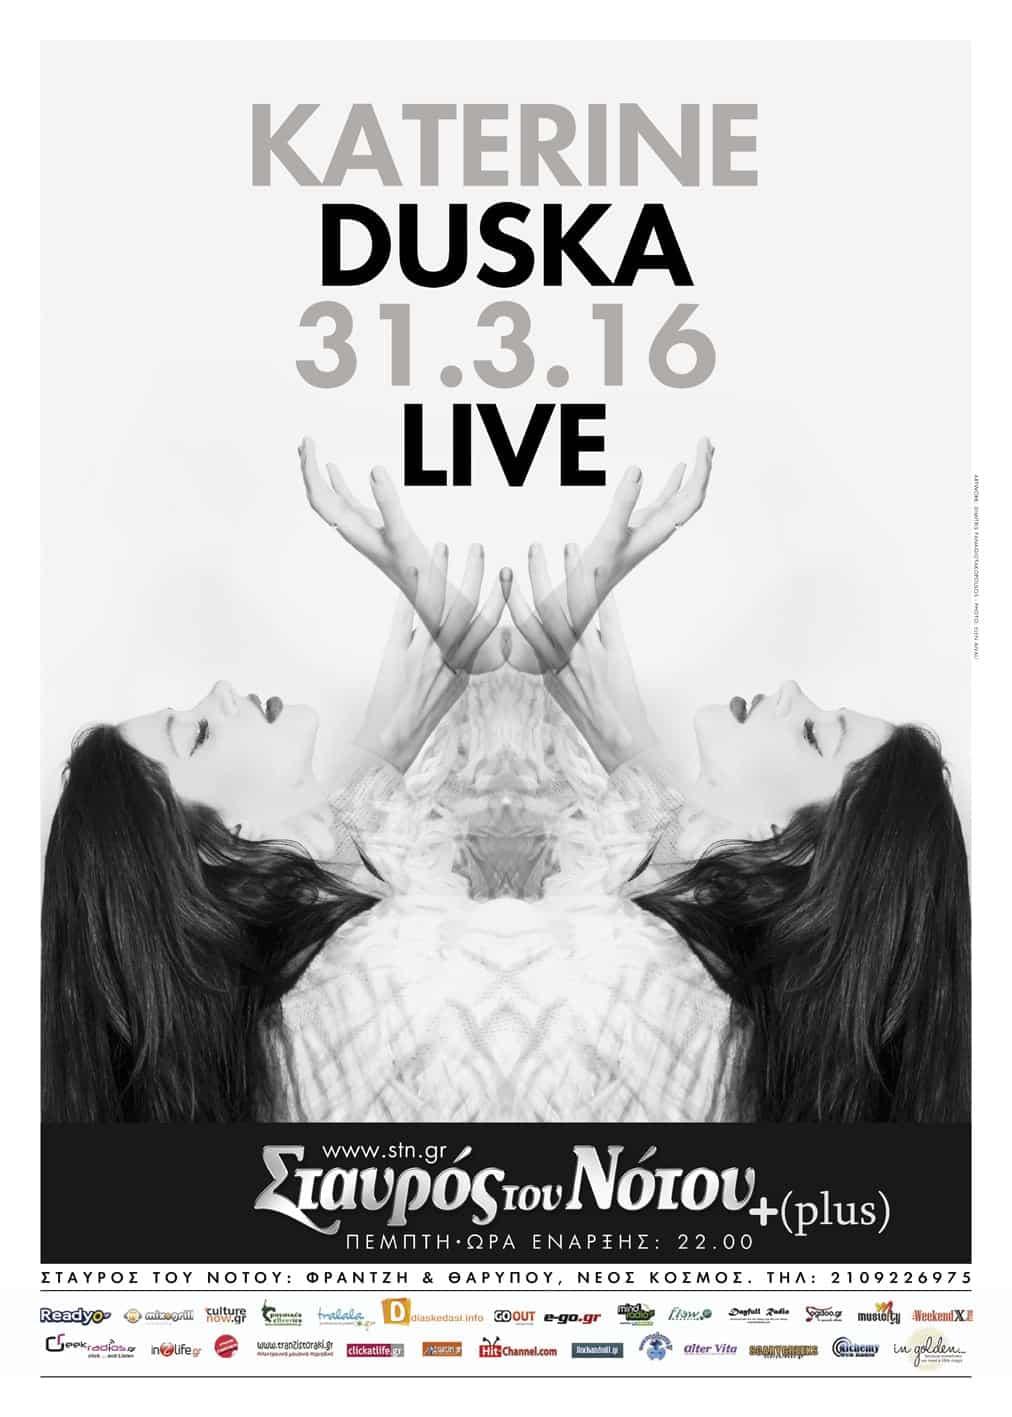 Duska_Poster_Stavros